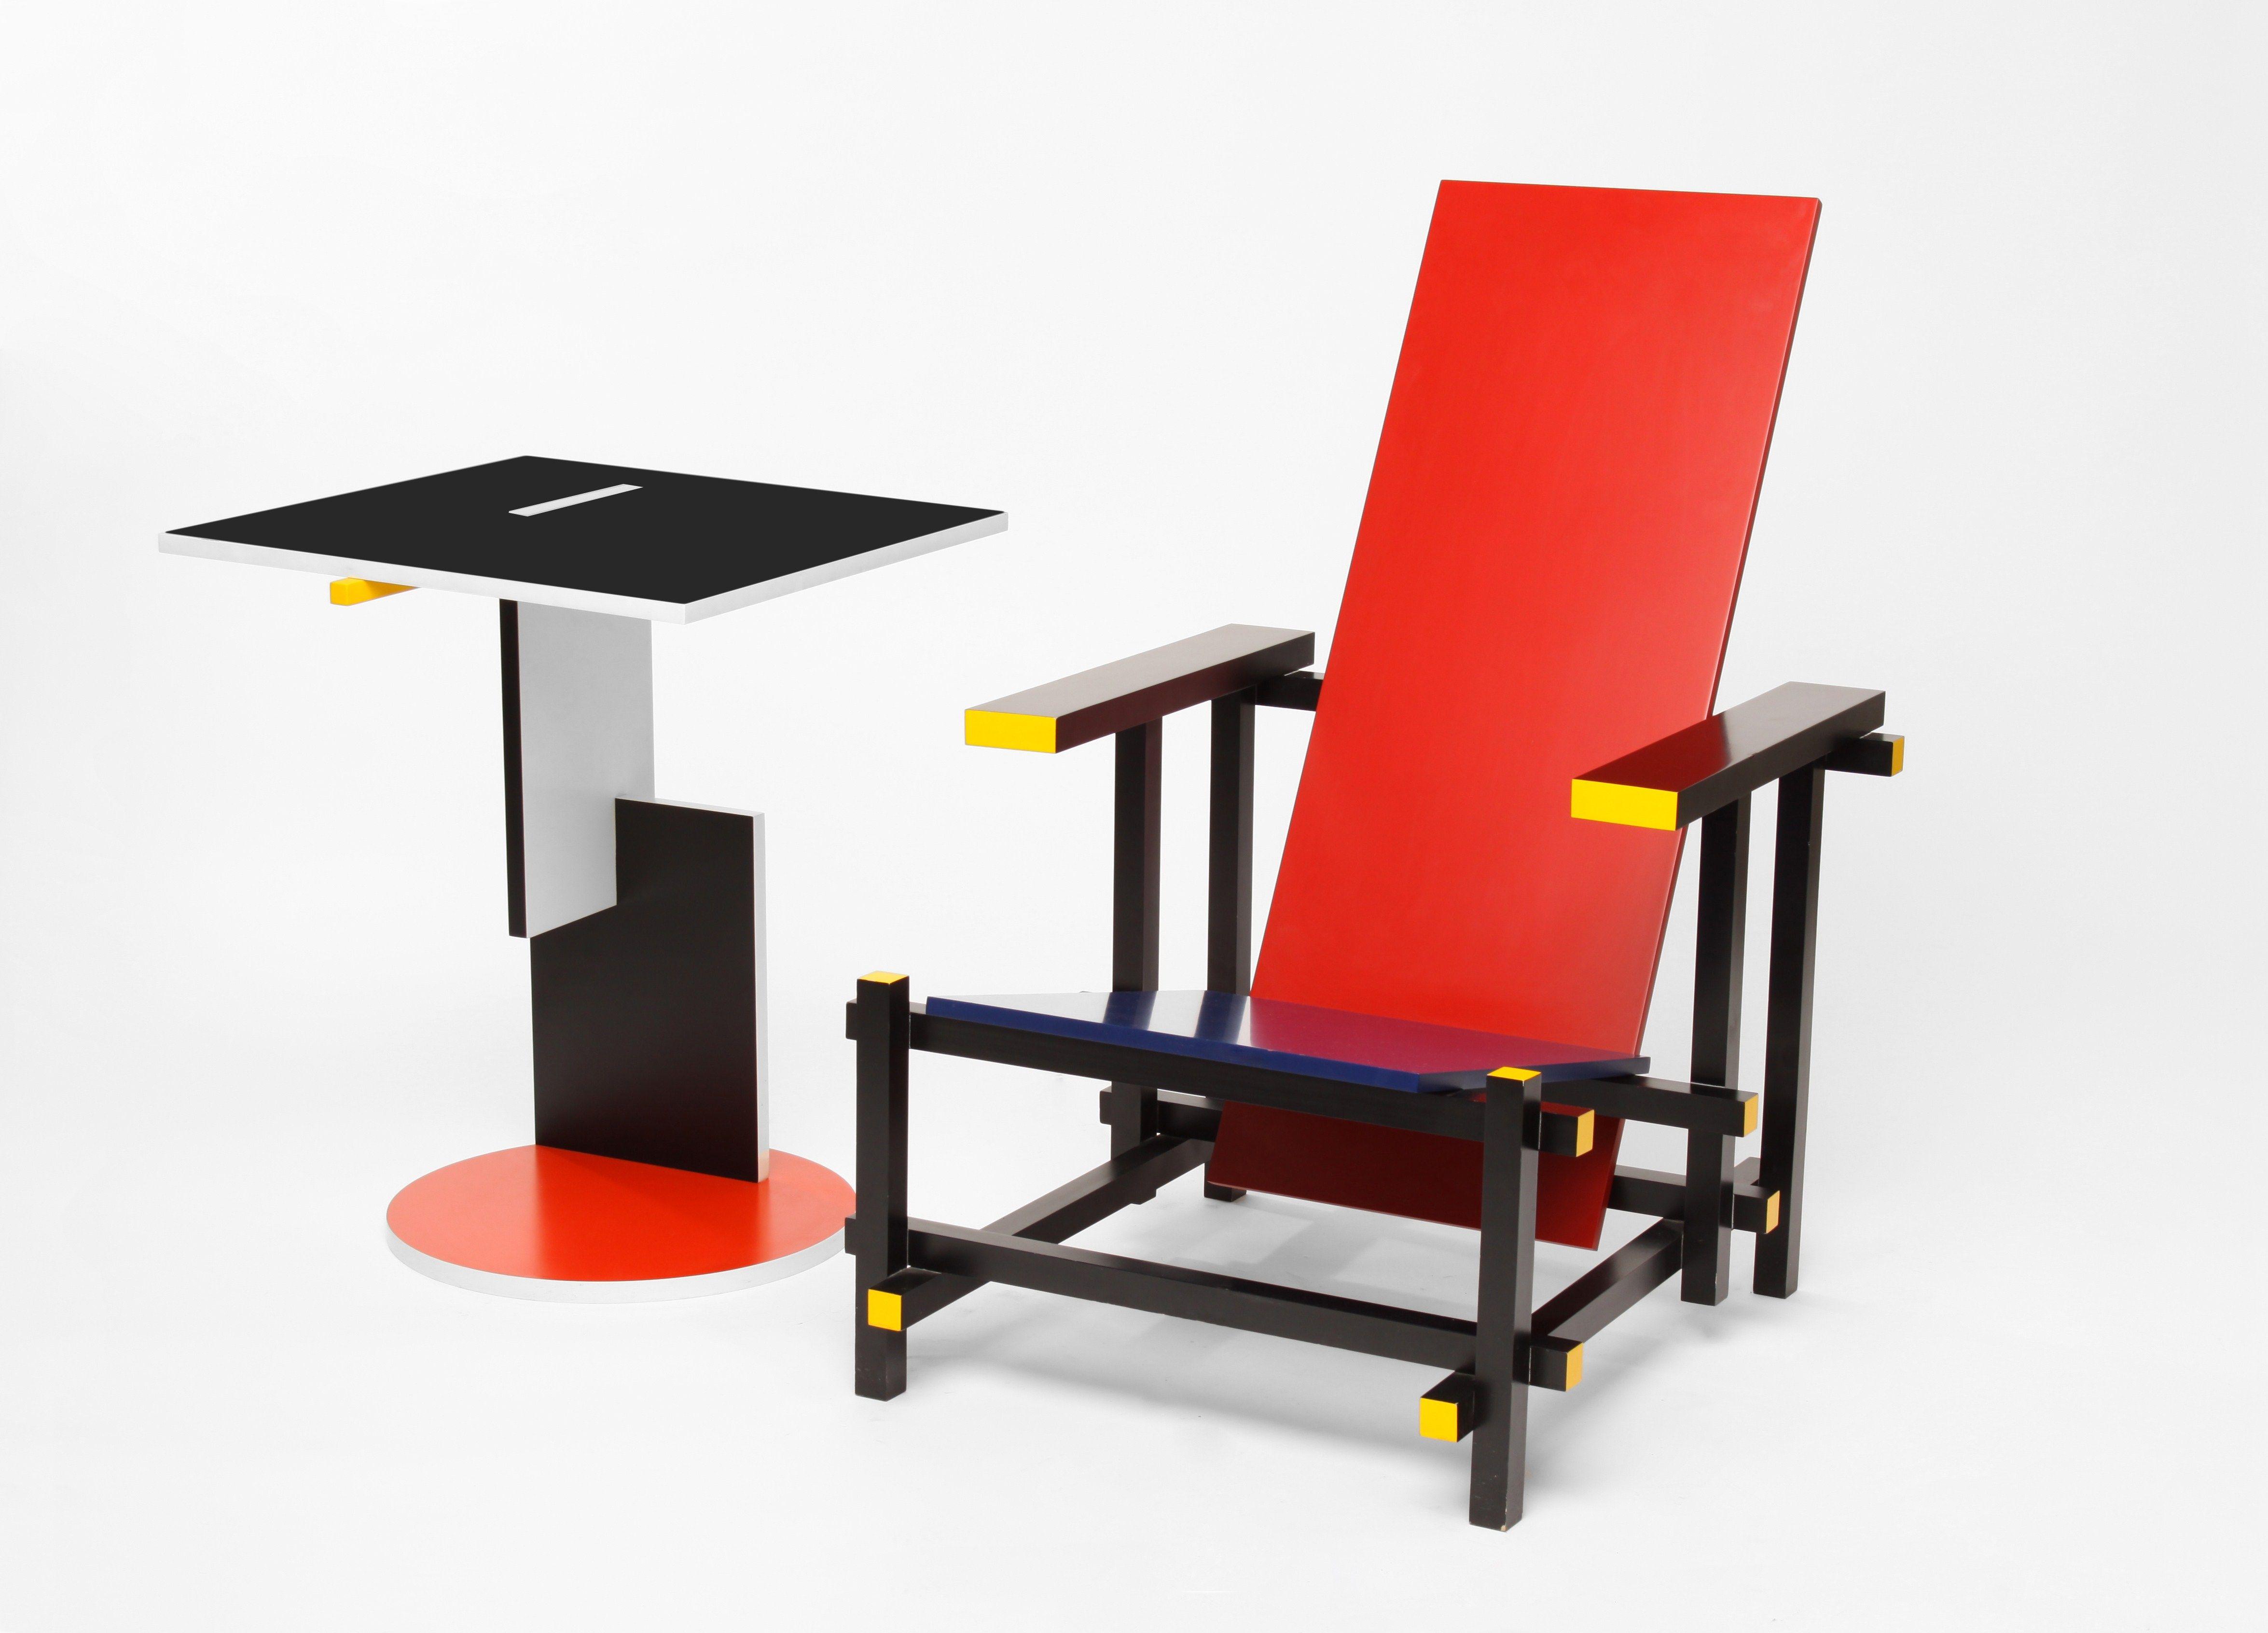 635 Red And Blue neoplasticizm red&blue chair Rietveld Strzeminski Kobro Pinterest